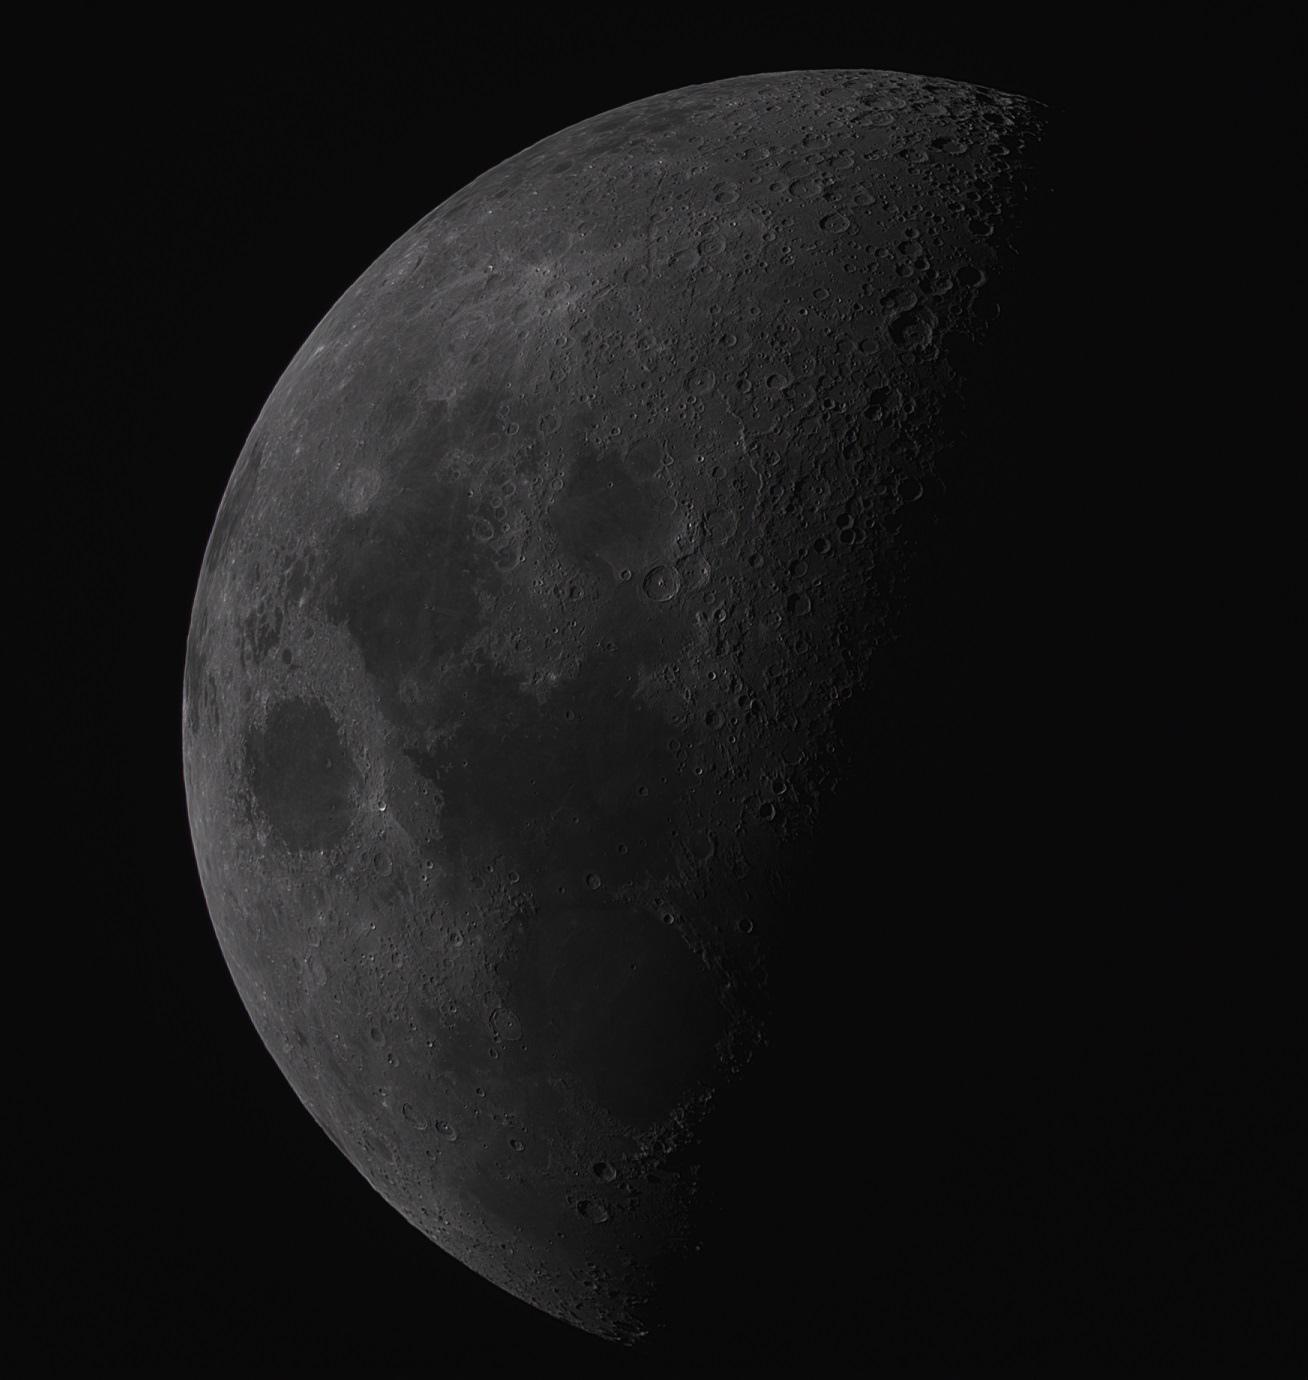 Moon_070819.jpg.24e42639dcc5a0476bc3baa6904f7de3.jpg